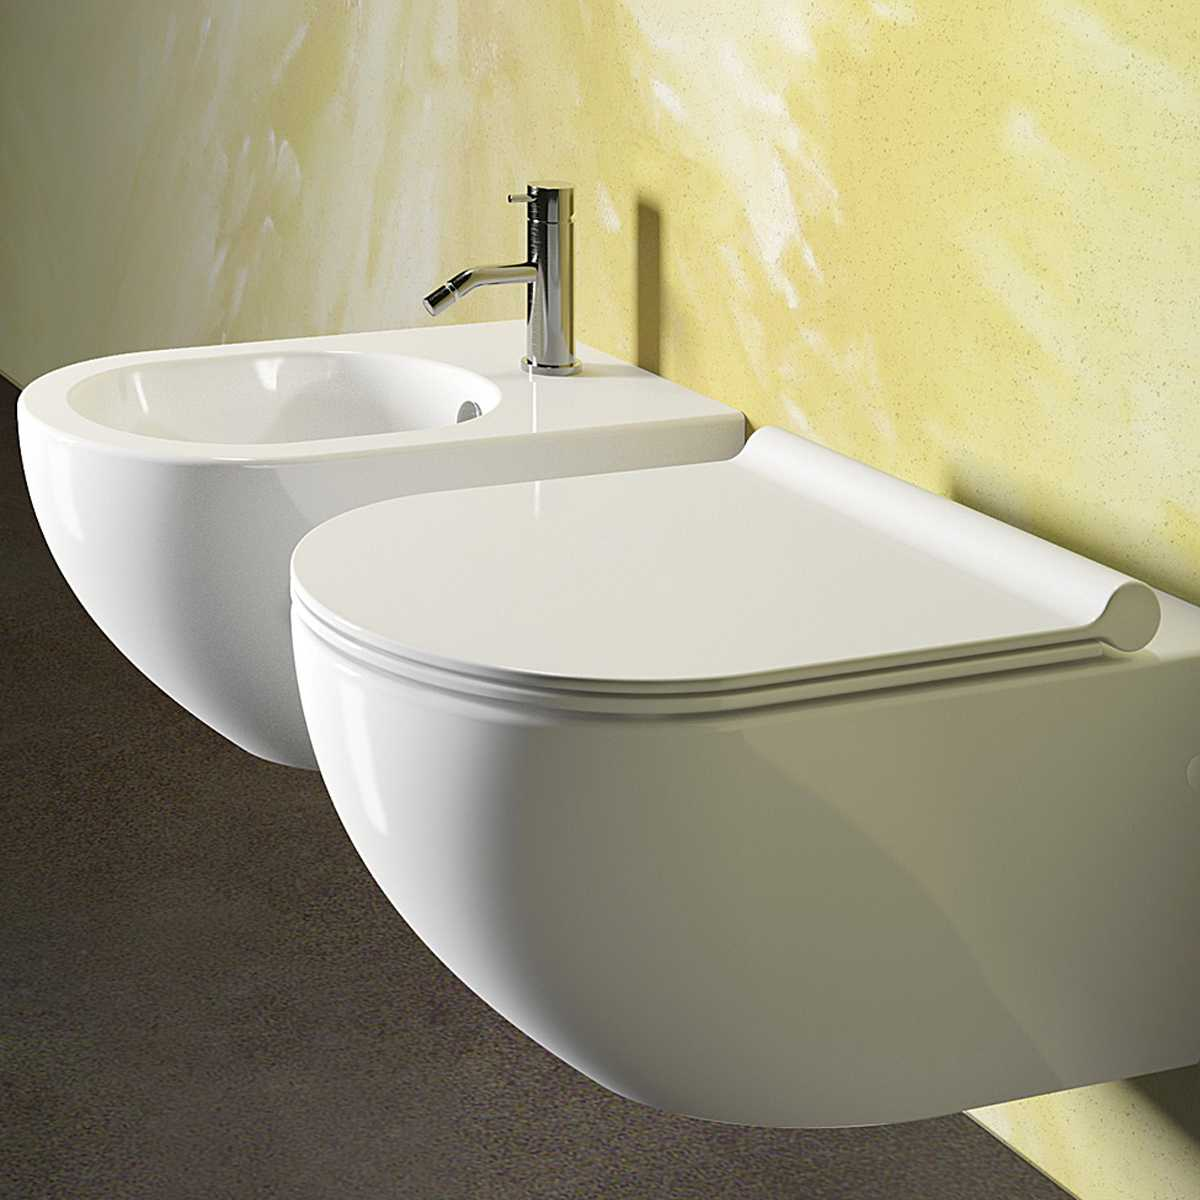 Sanitari Sospesi Ceramica Catalano Sfera 54 con sedile soft close slim ECO